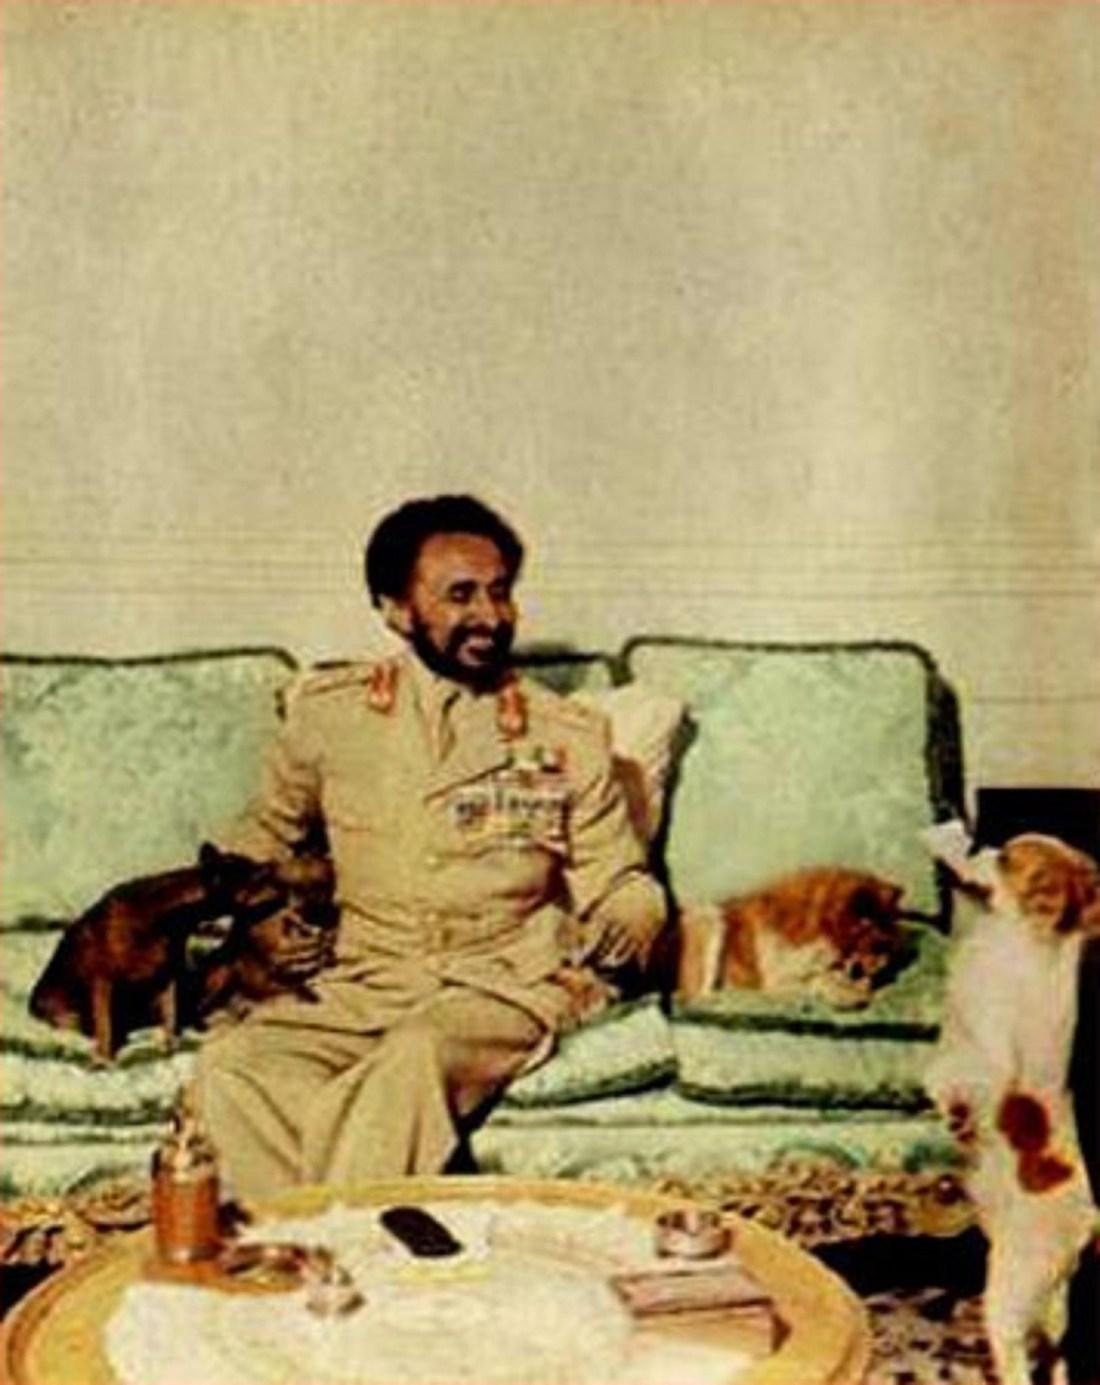 Ethiopia, Ethiopian, Rastafarian, Ethiopian History, African History, KOLUMN Magazine, KOLUMN